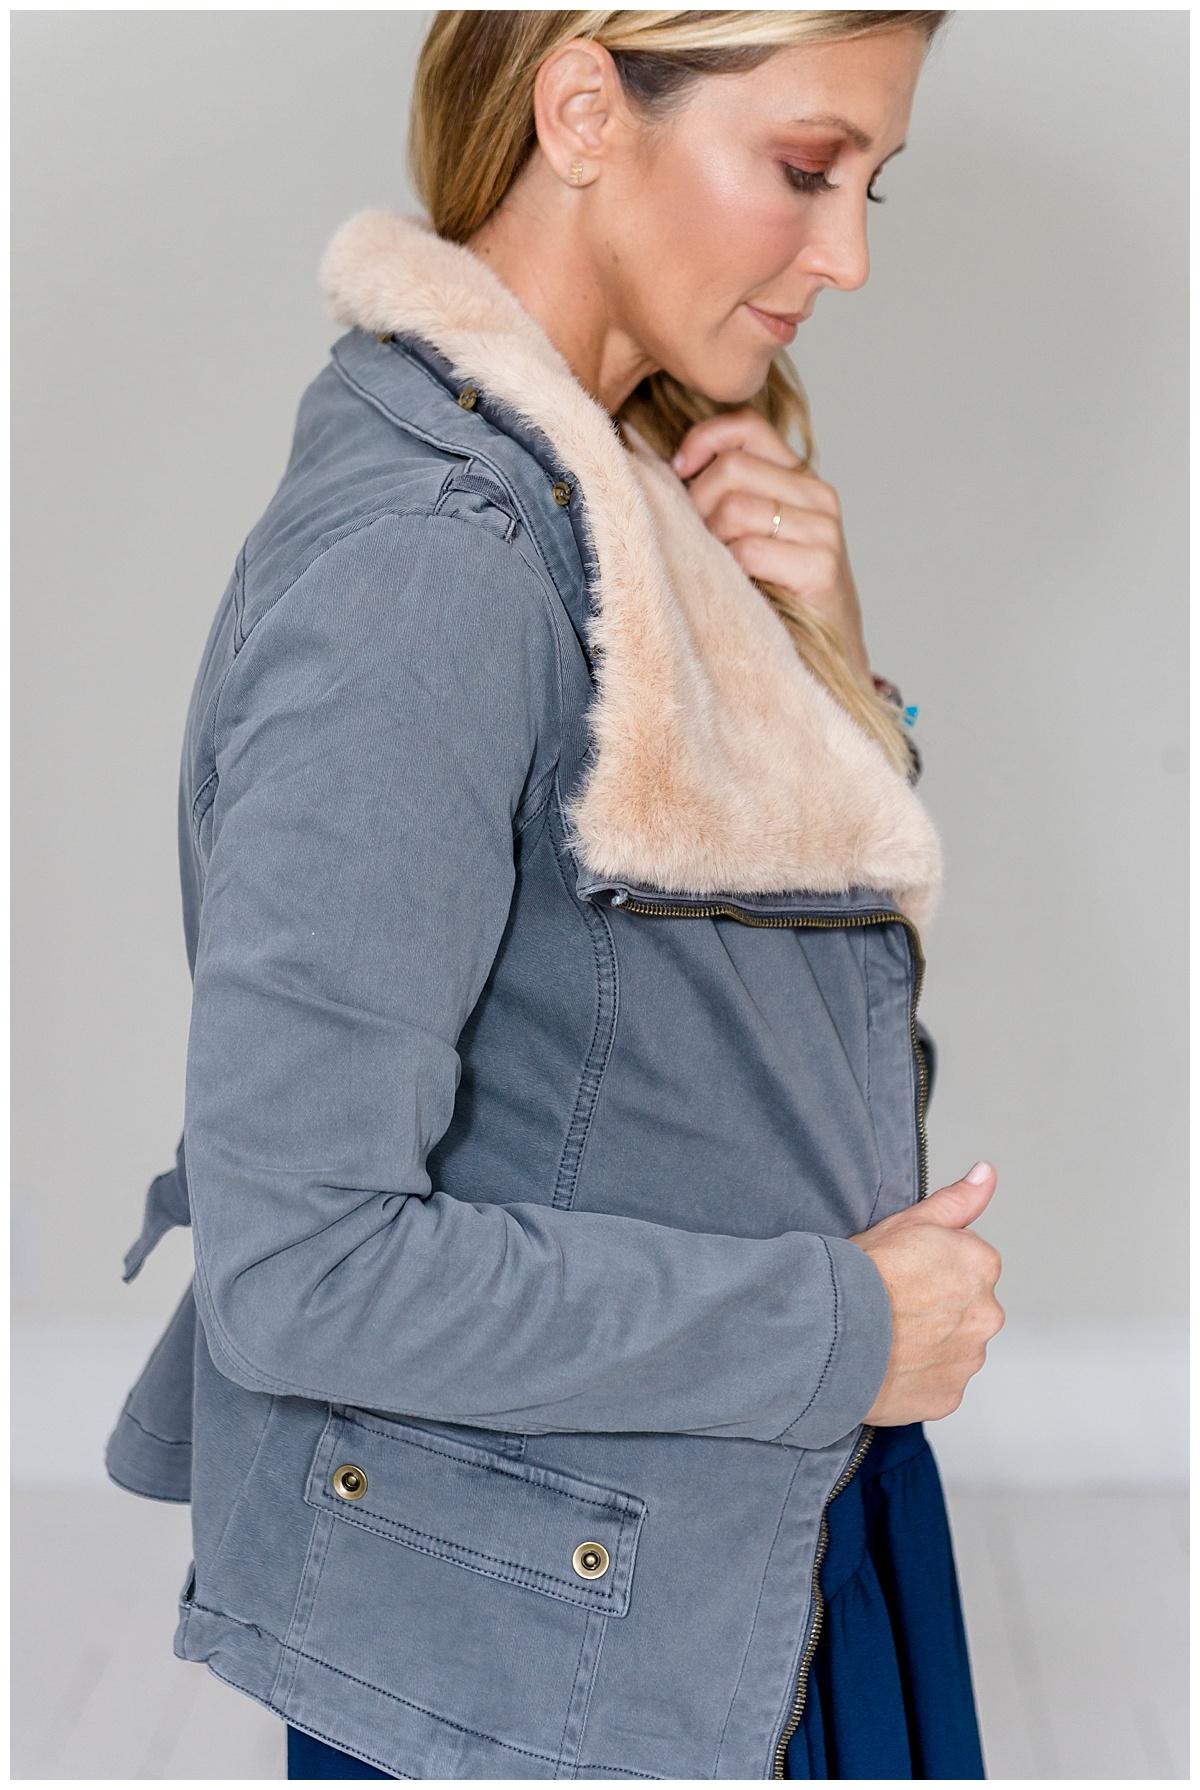 Fall jackets_1377.jpg